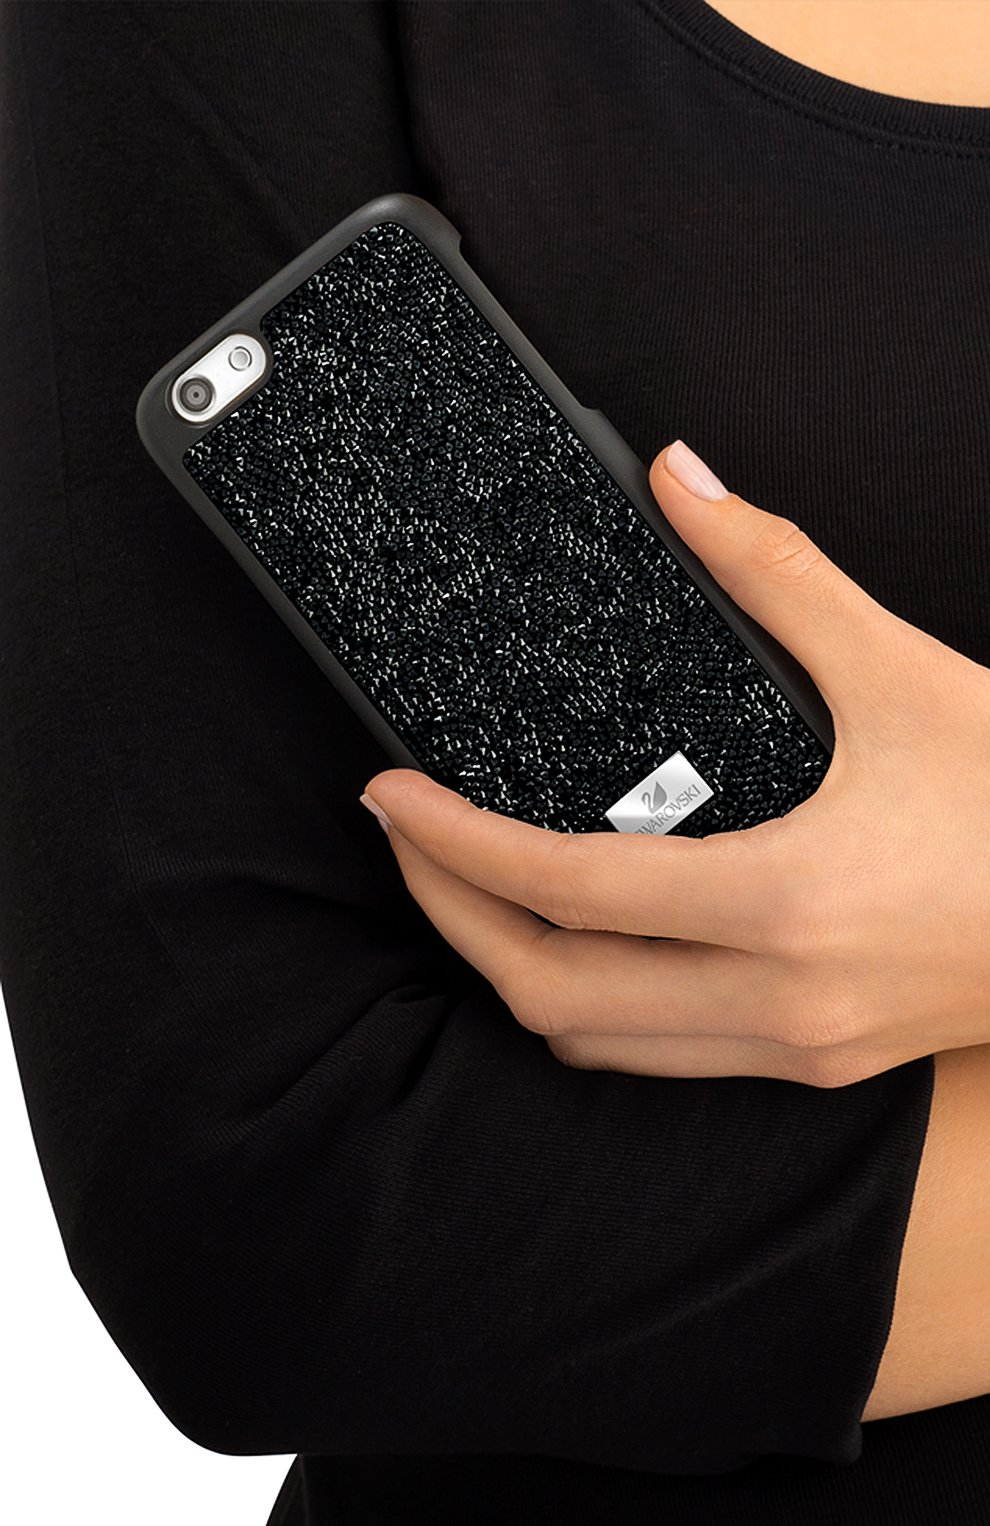 Чехол для iPhone 7 Glam Rock с кристаллами Swarovski   Фото №2